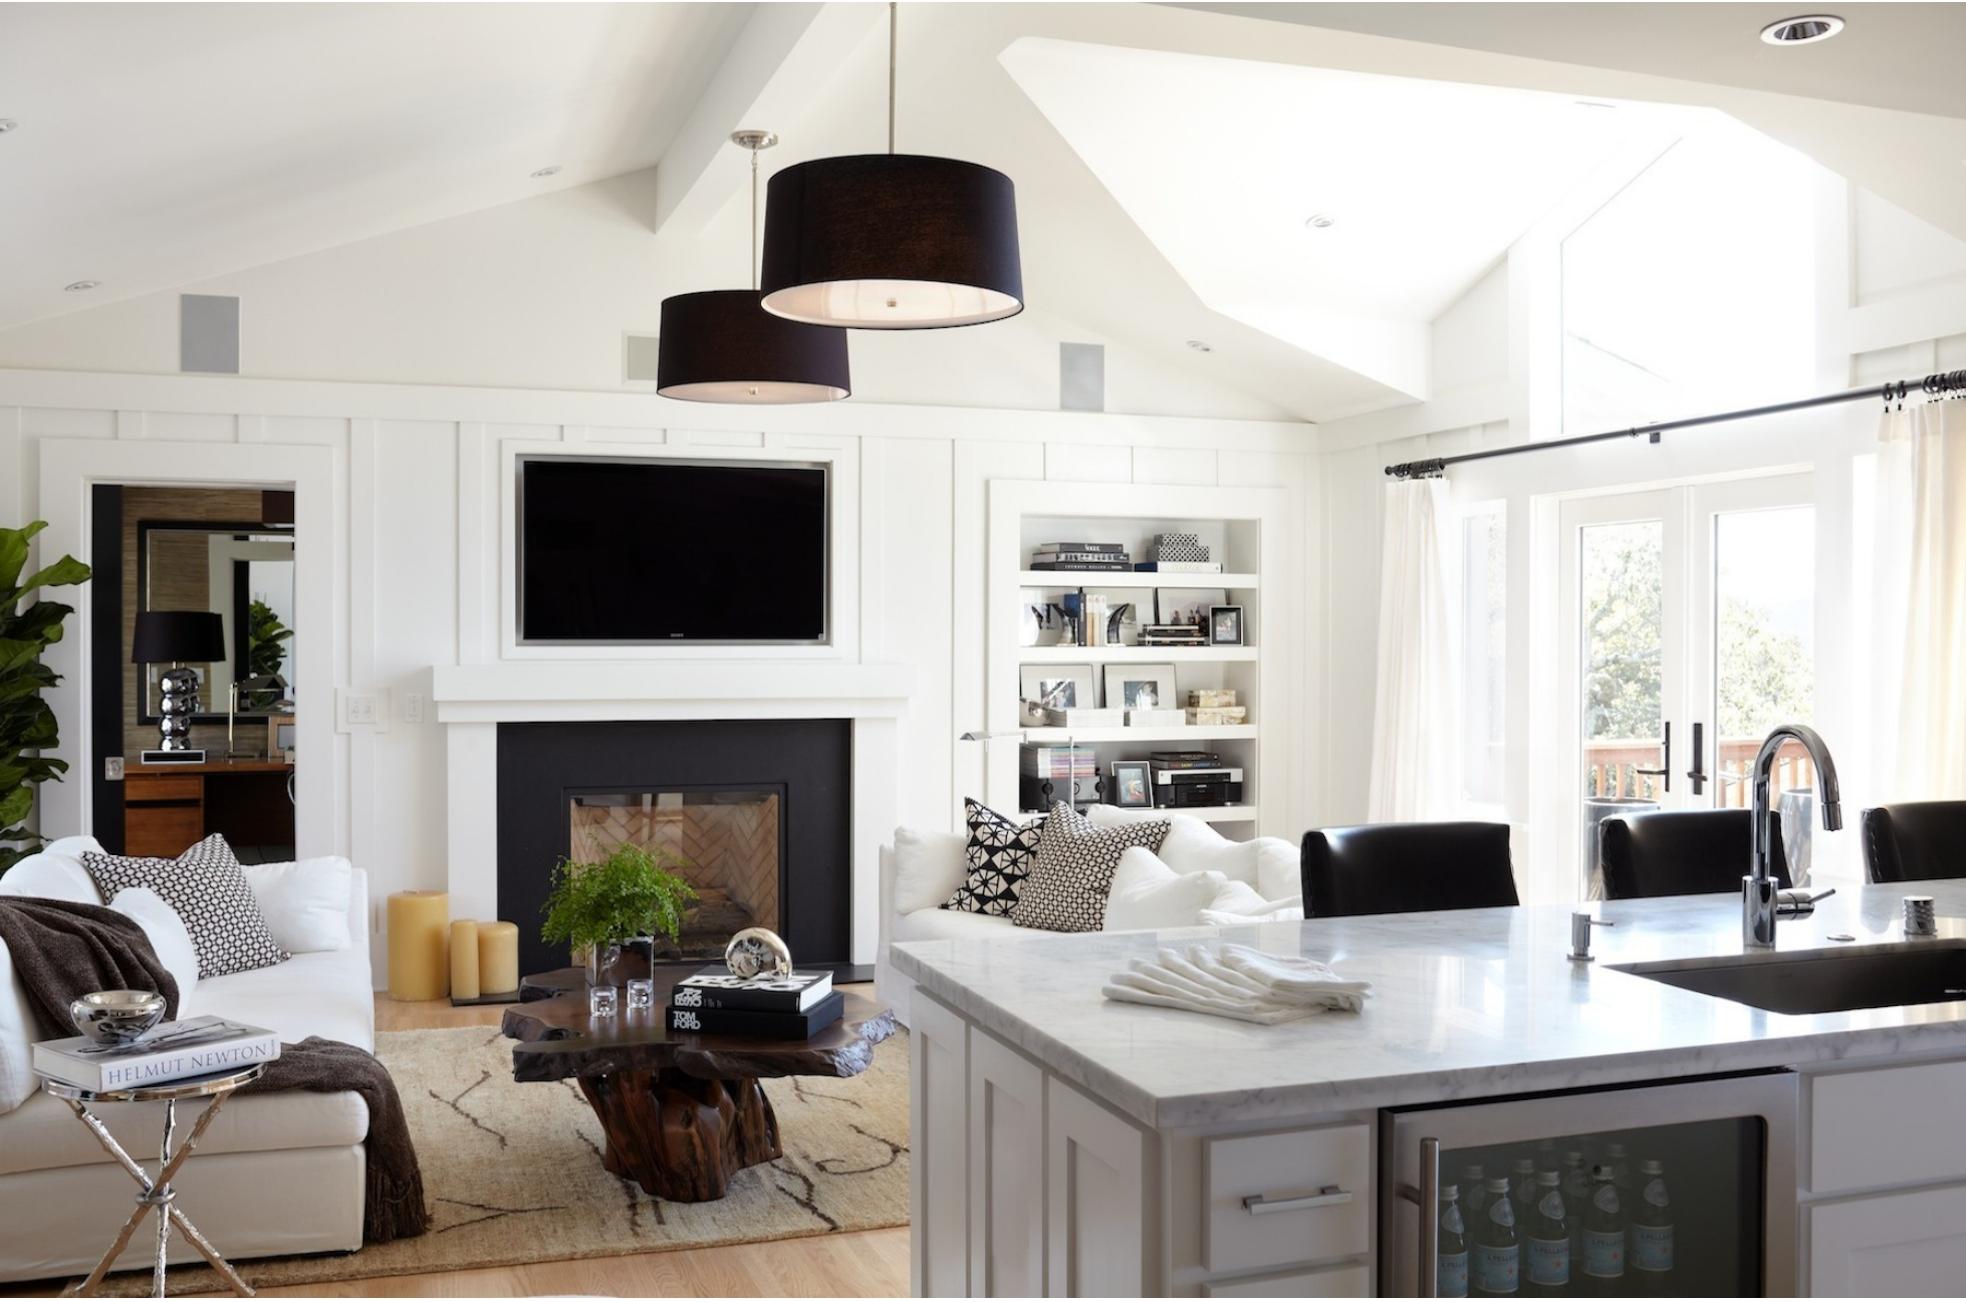 vaulted ceiling white drum shade pendants neutrals